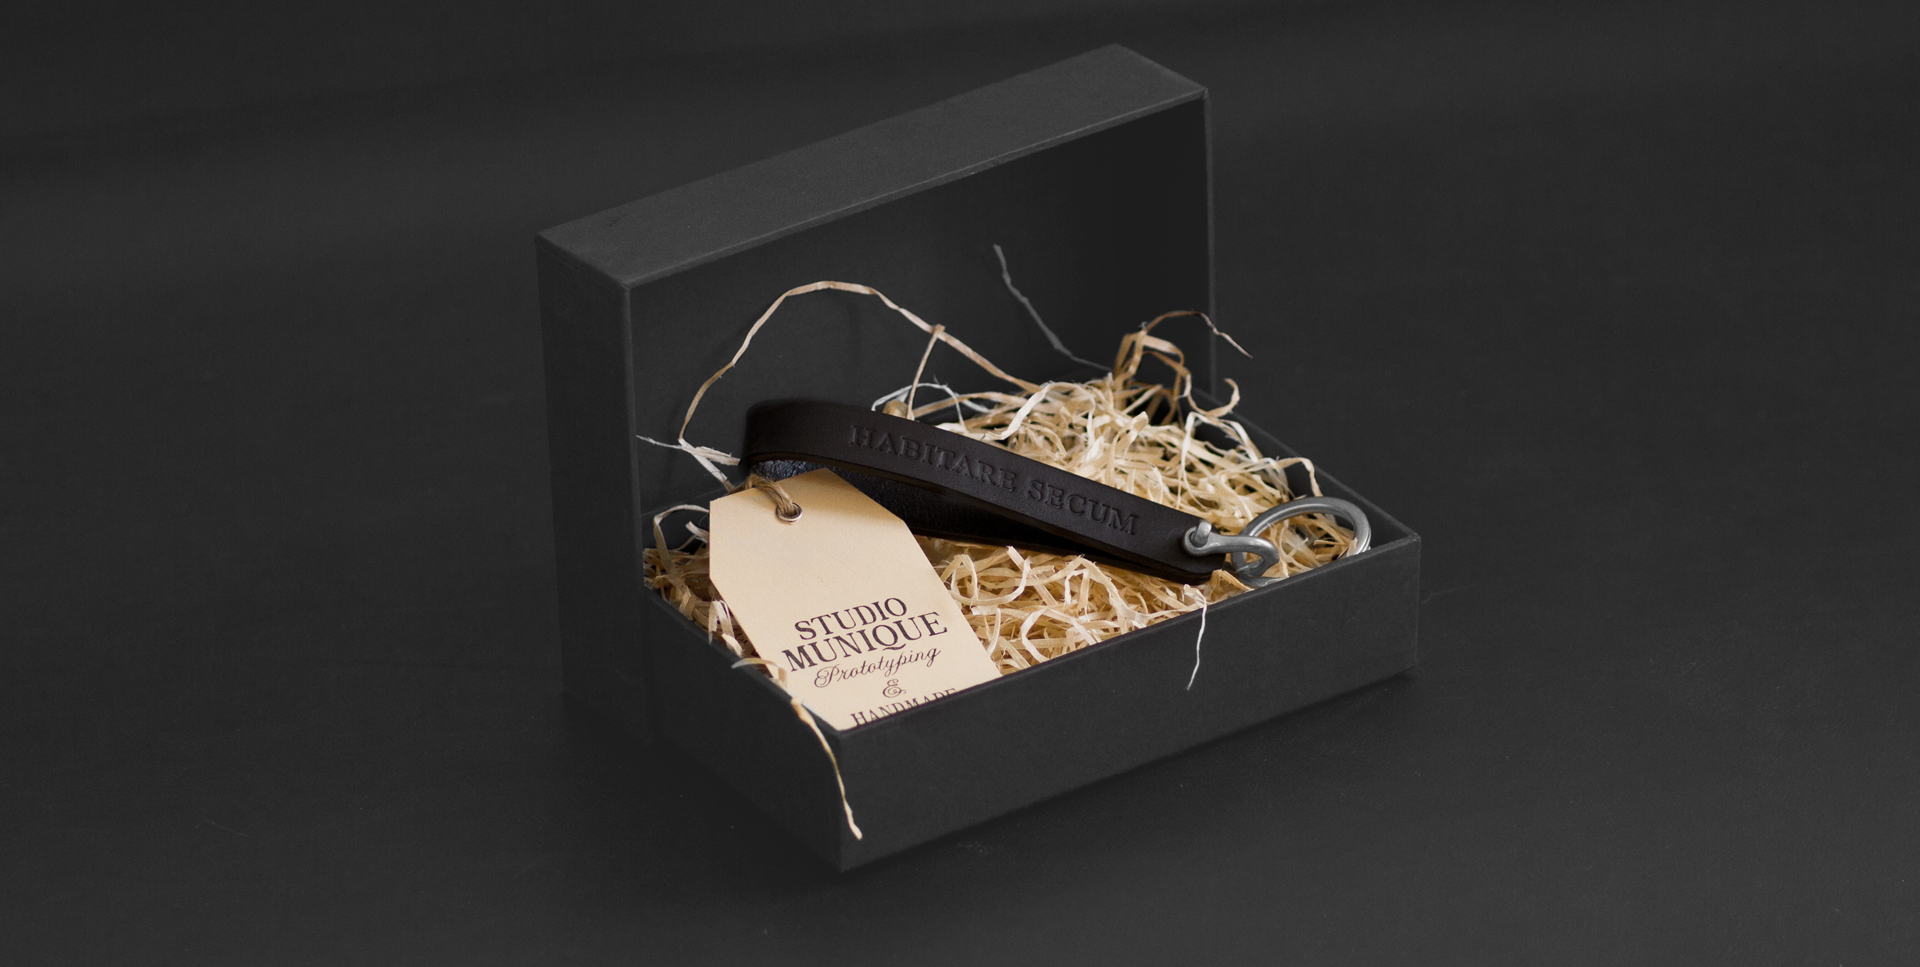 Markus-Merbach-box-detail-2-STUDIO-MUNIQUE-1